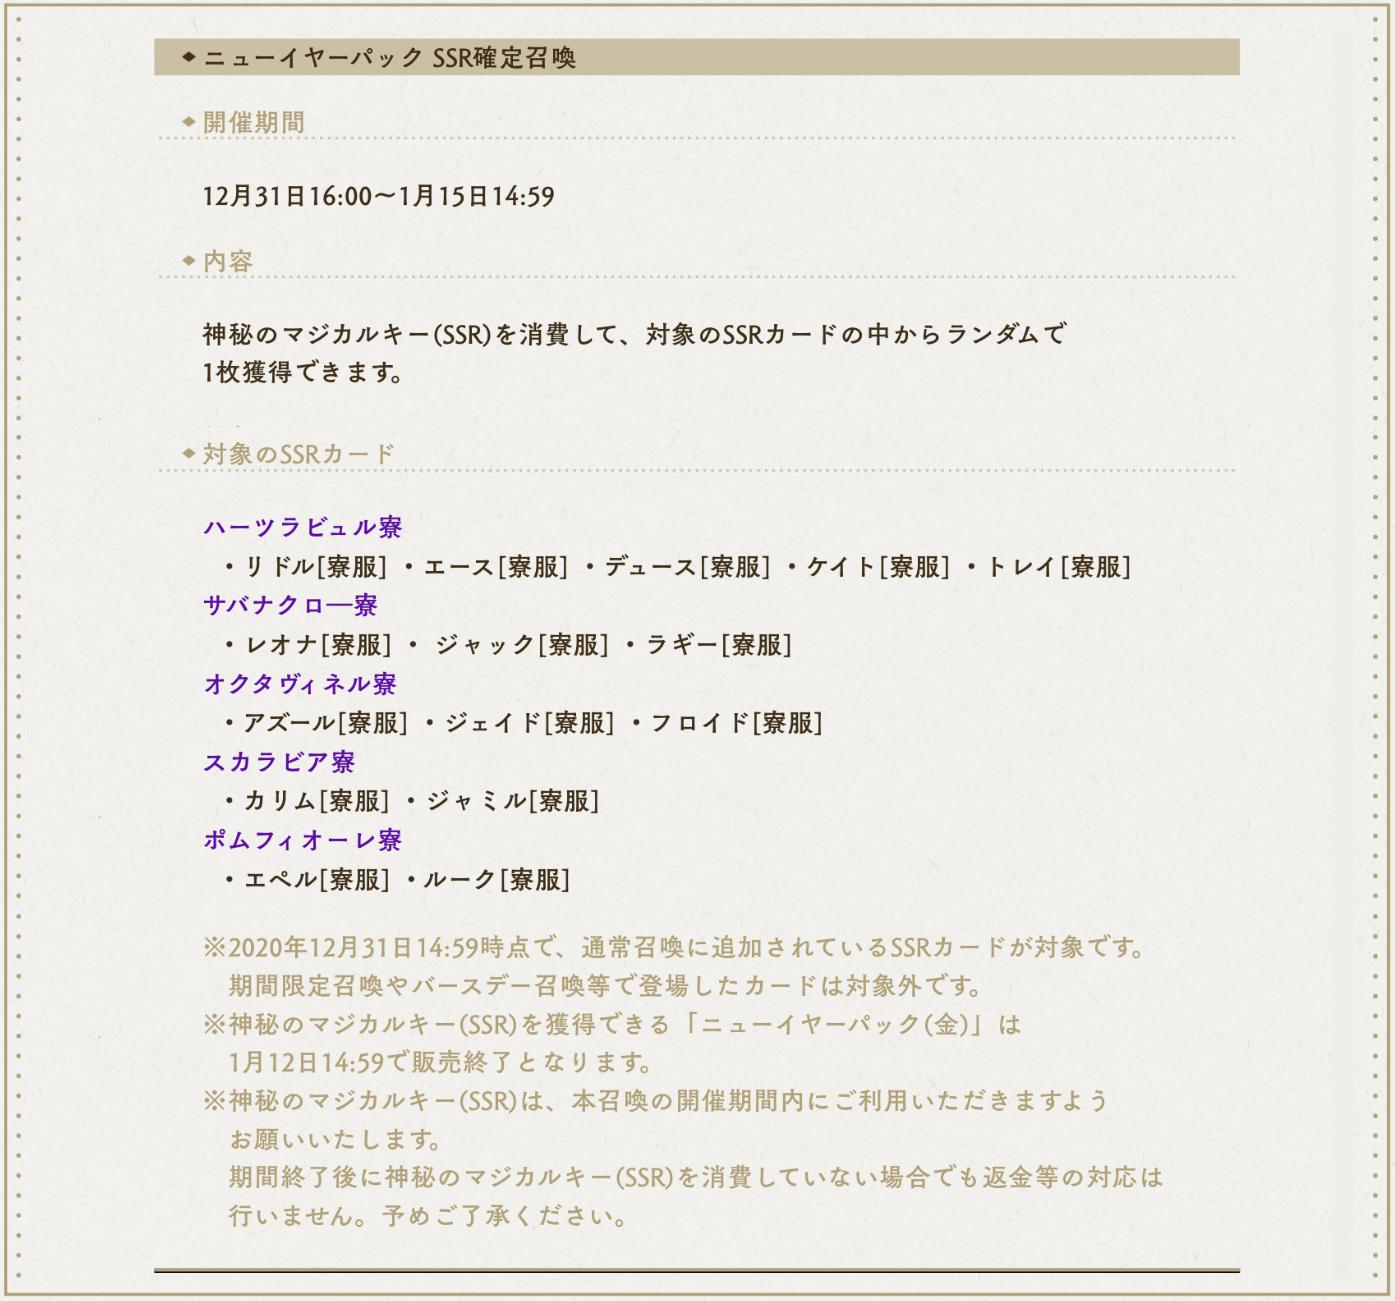 f:id:motimoti444:20201228164649p:plain